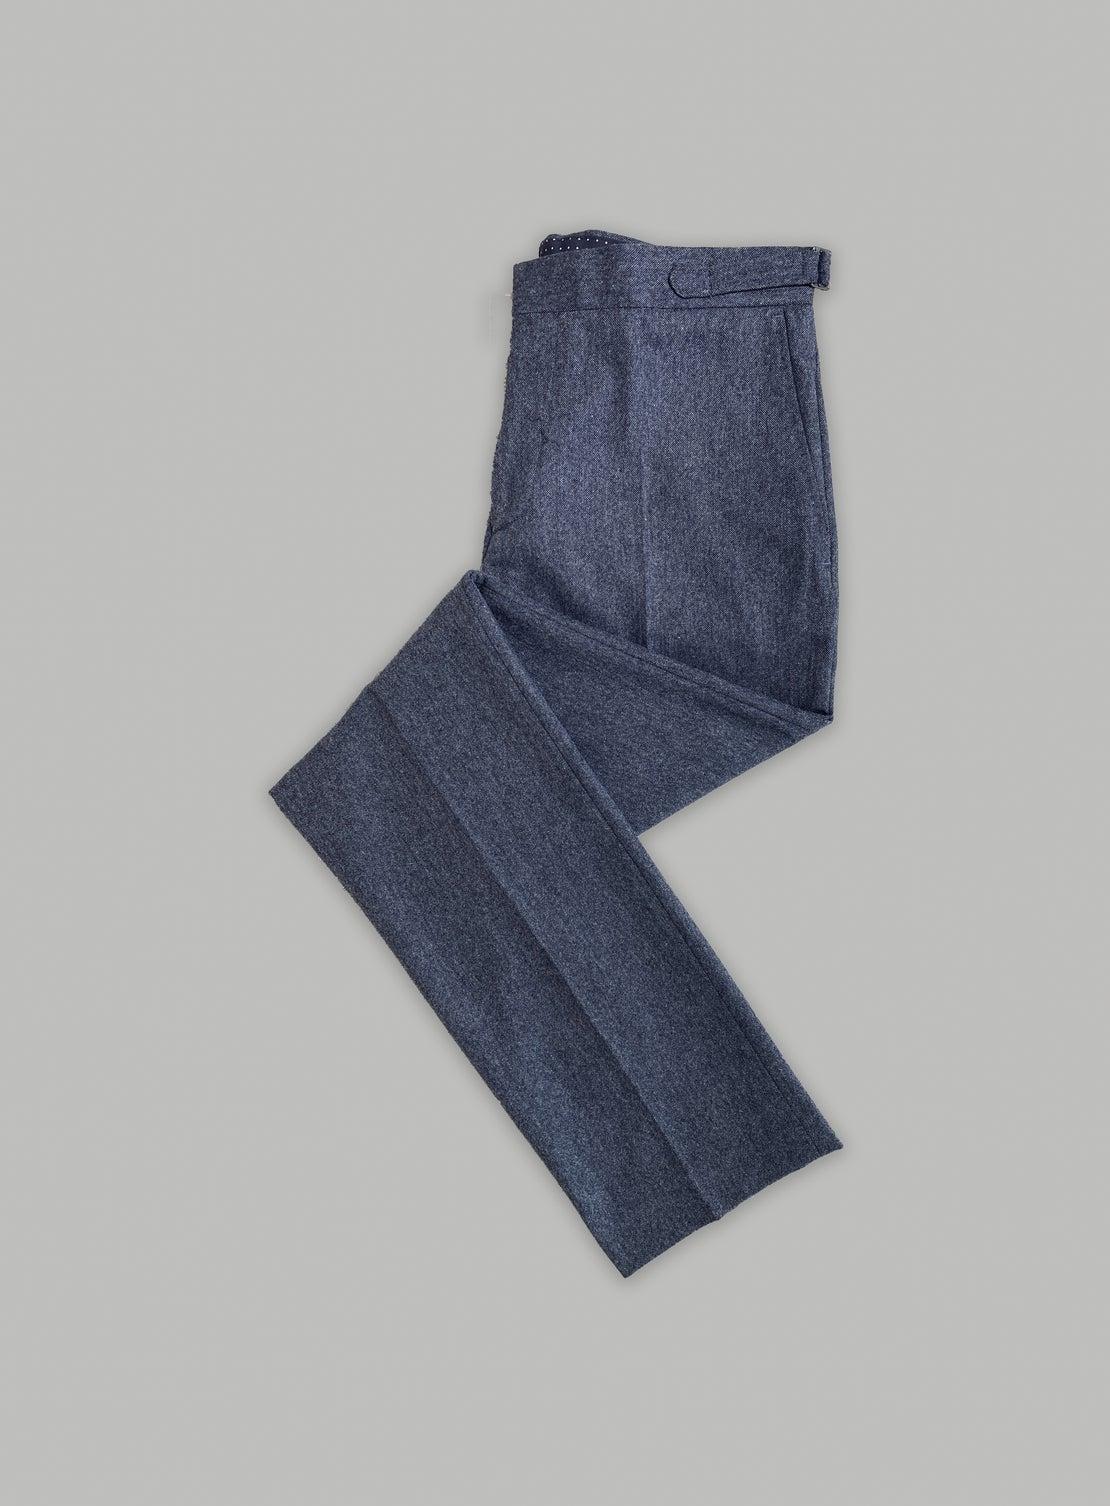 Blue Tweed Separates Trouser